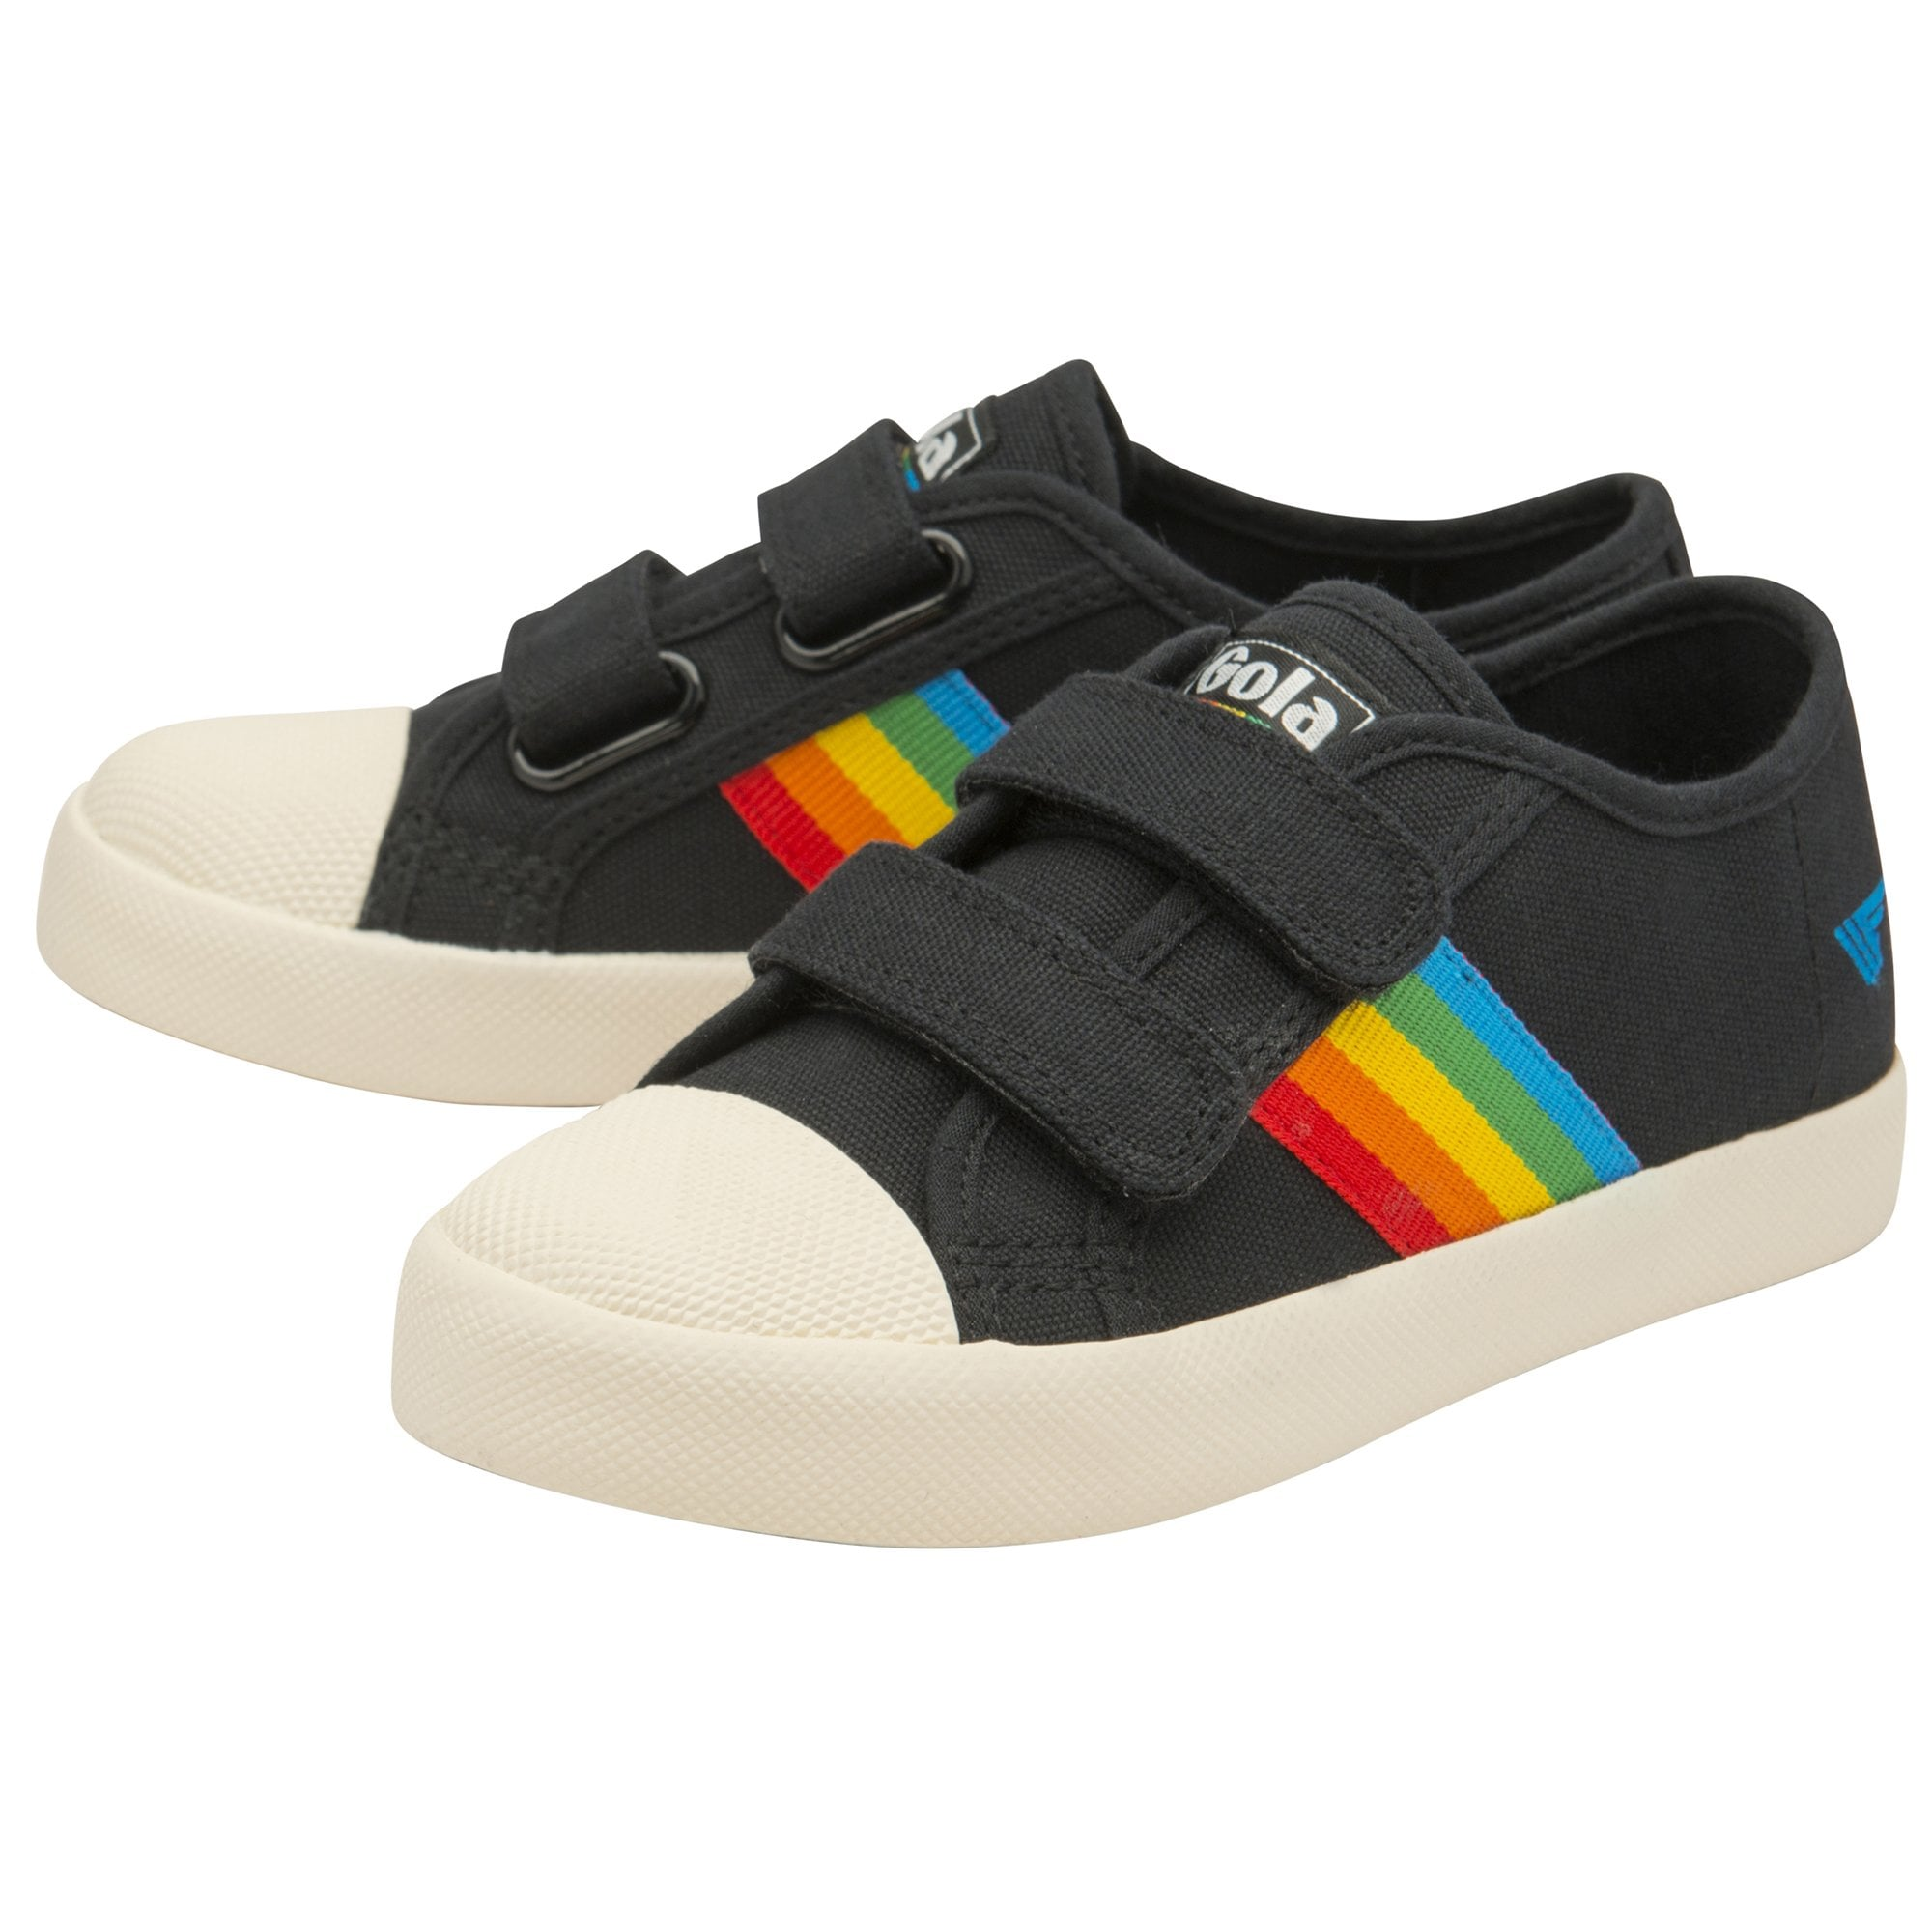 Buy Gola kids Coaster Rainbow Strap